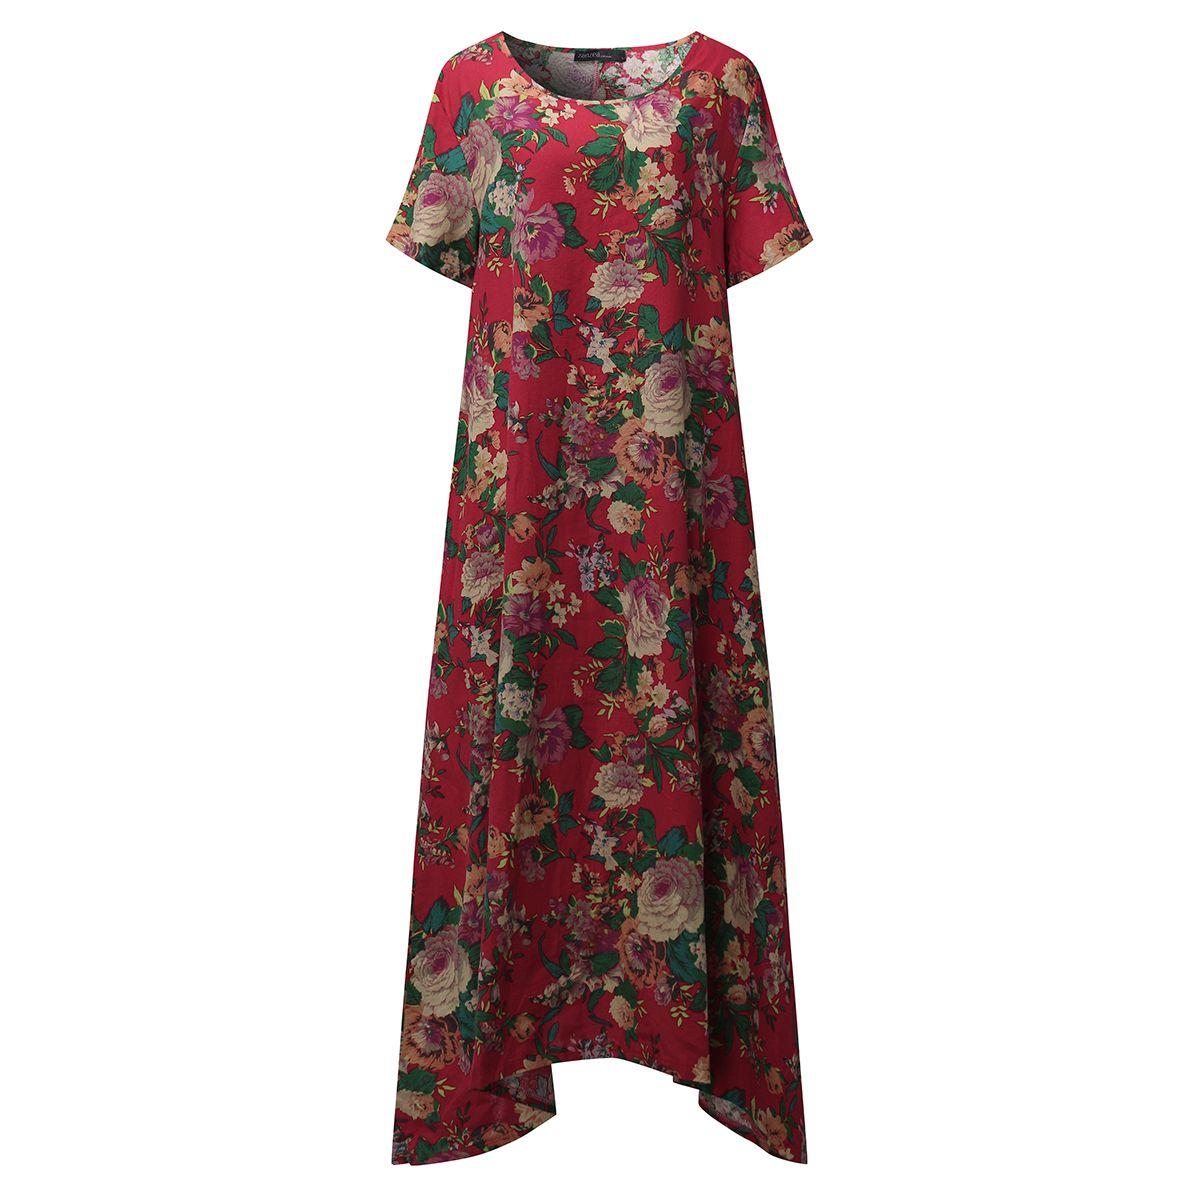 Zanzea women round neck loose short sleeve batwing floral print